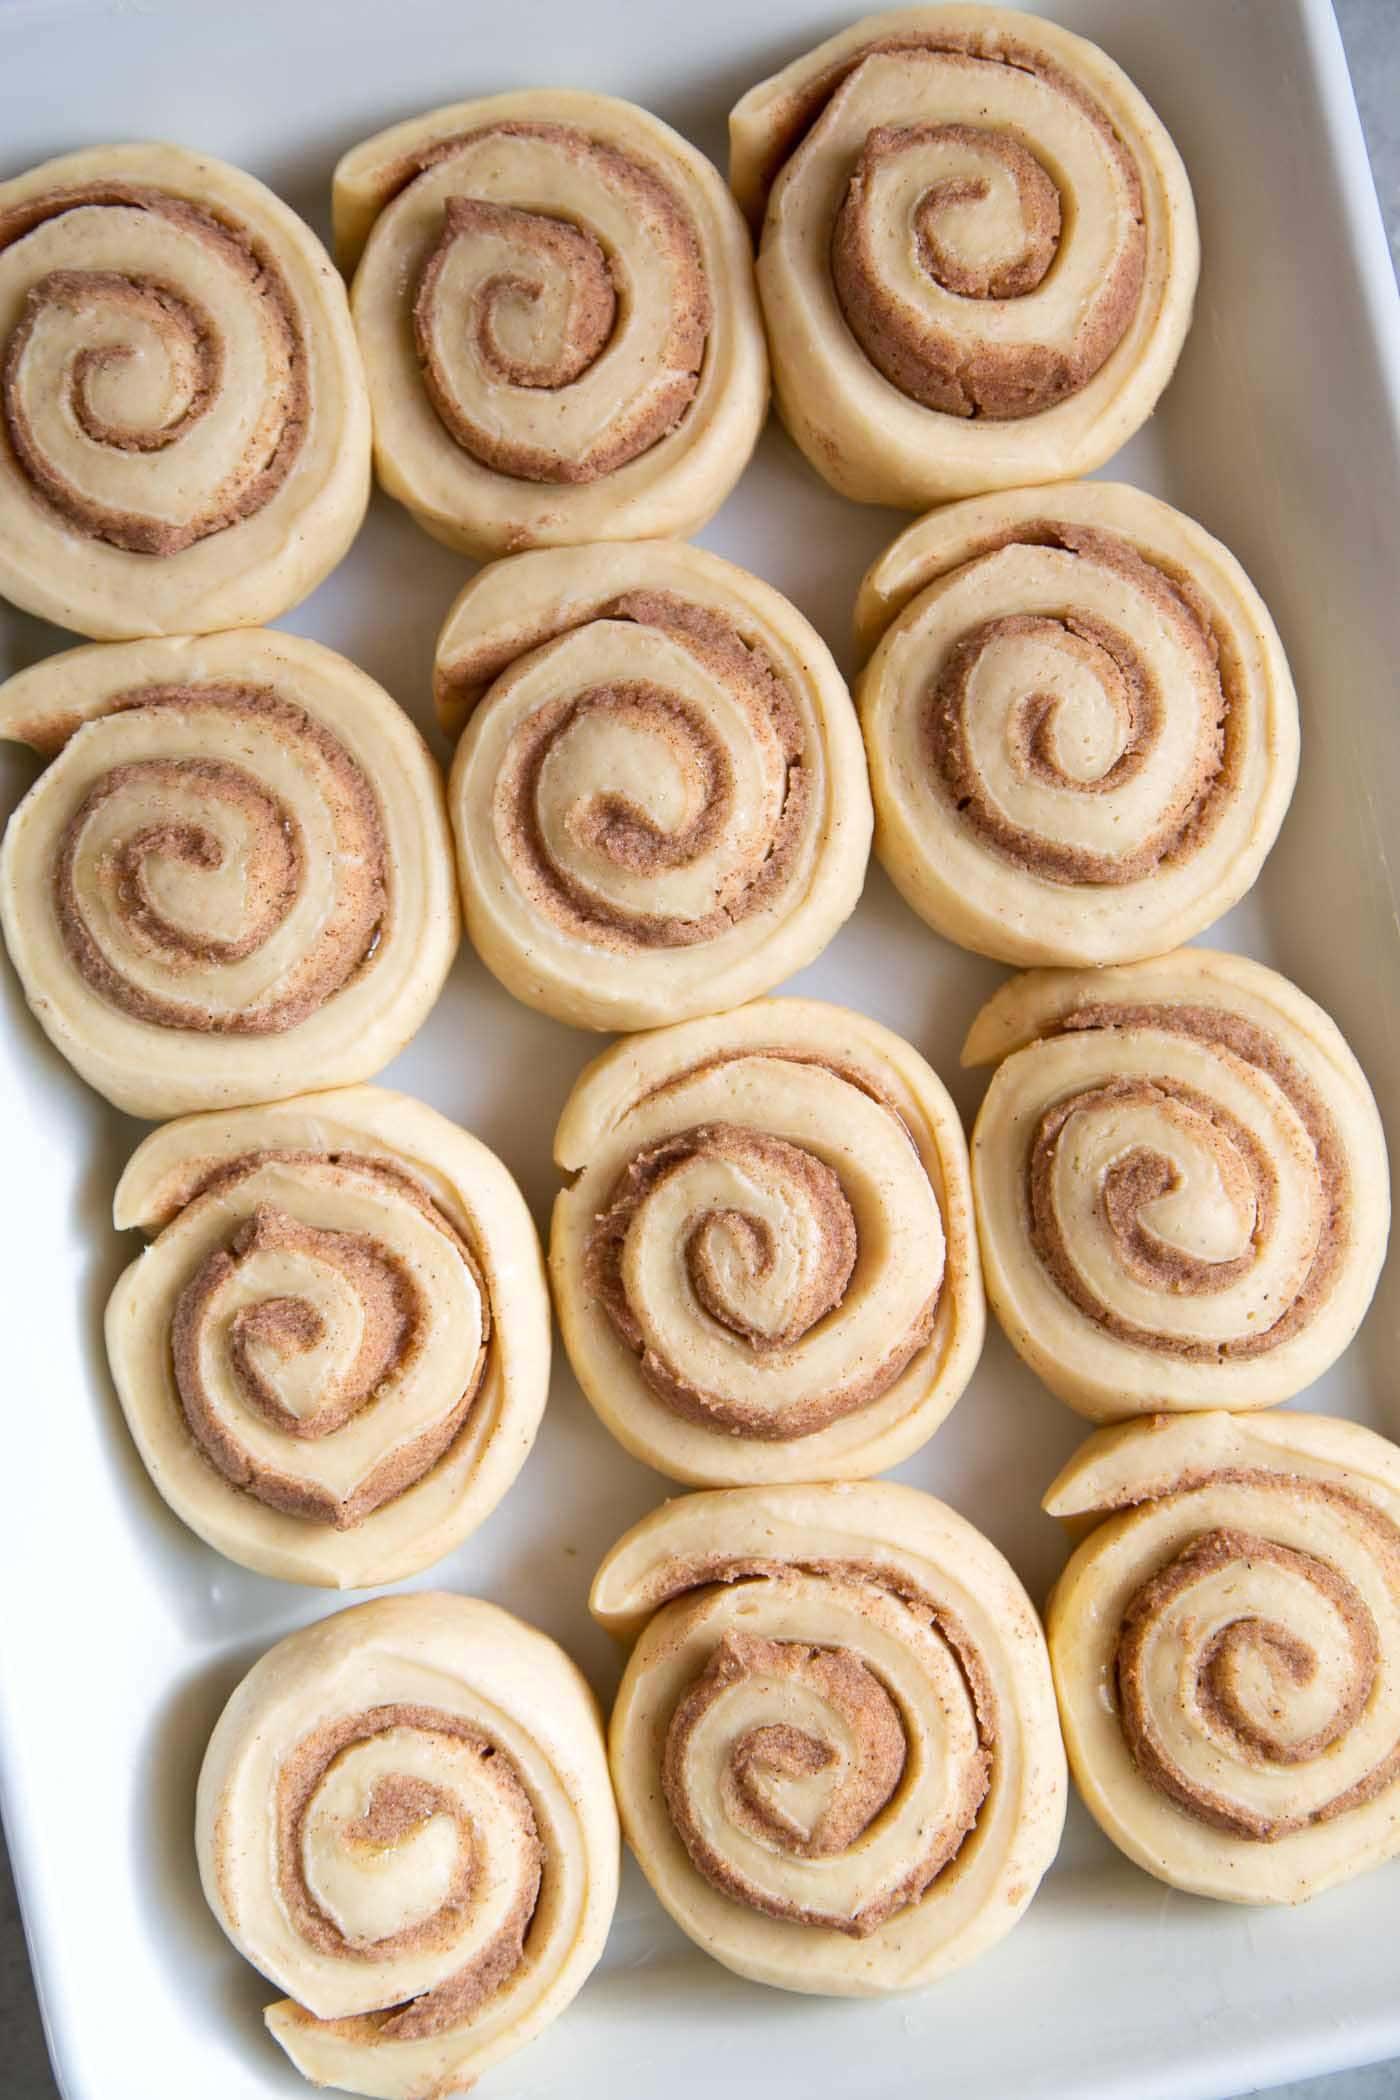 Eggnog Cinnamon Rolls before baking